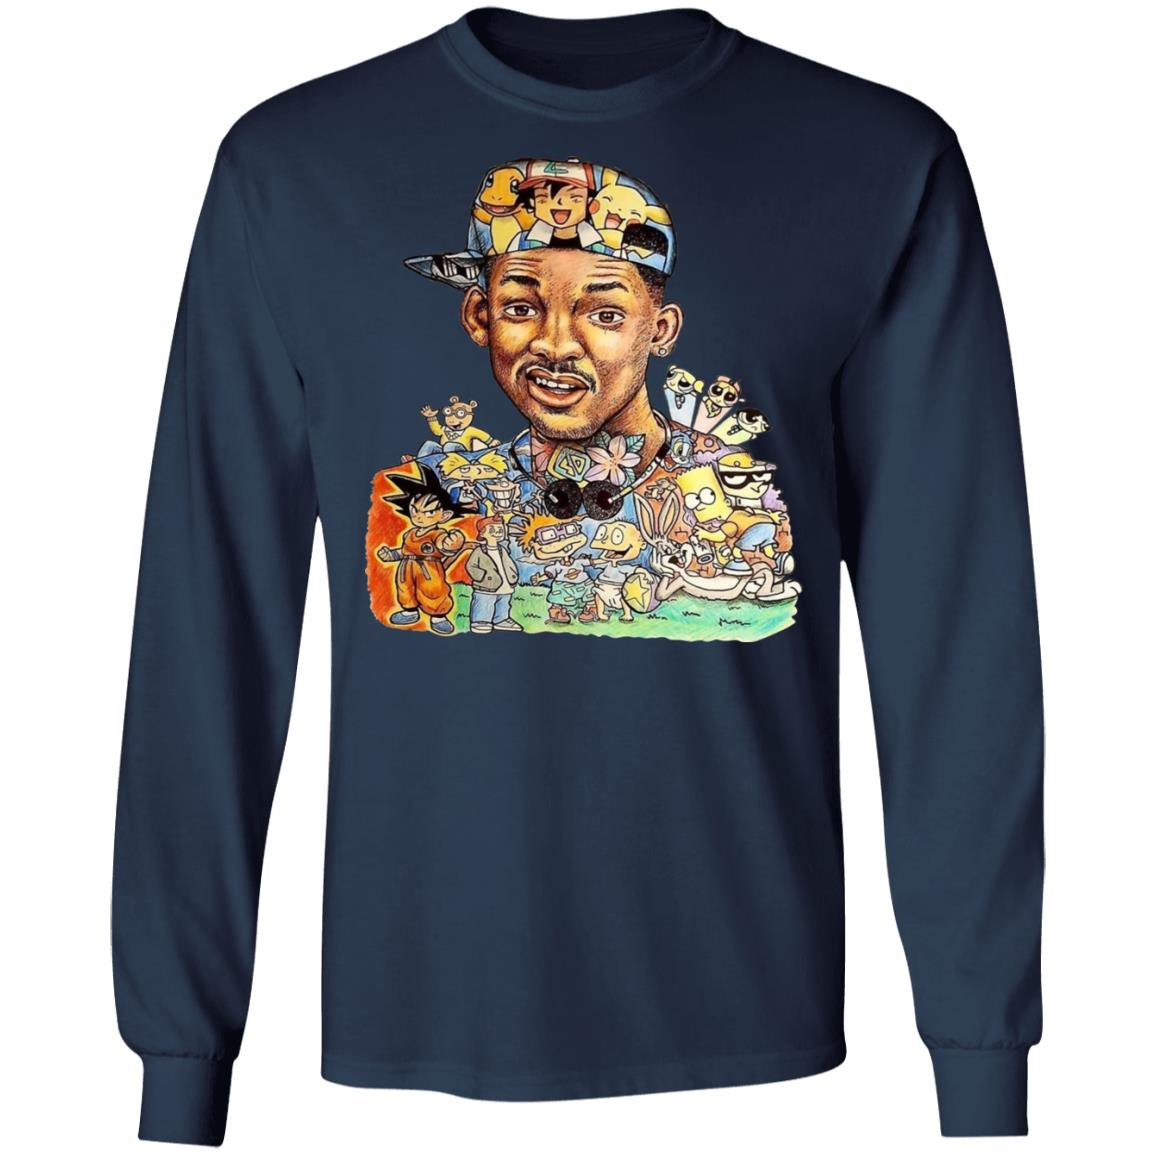 Funny The Fresh Prince Of Bel Air Will Smith 90s Cartoon Shirts Robinplacefabrics